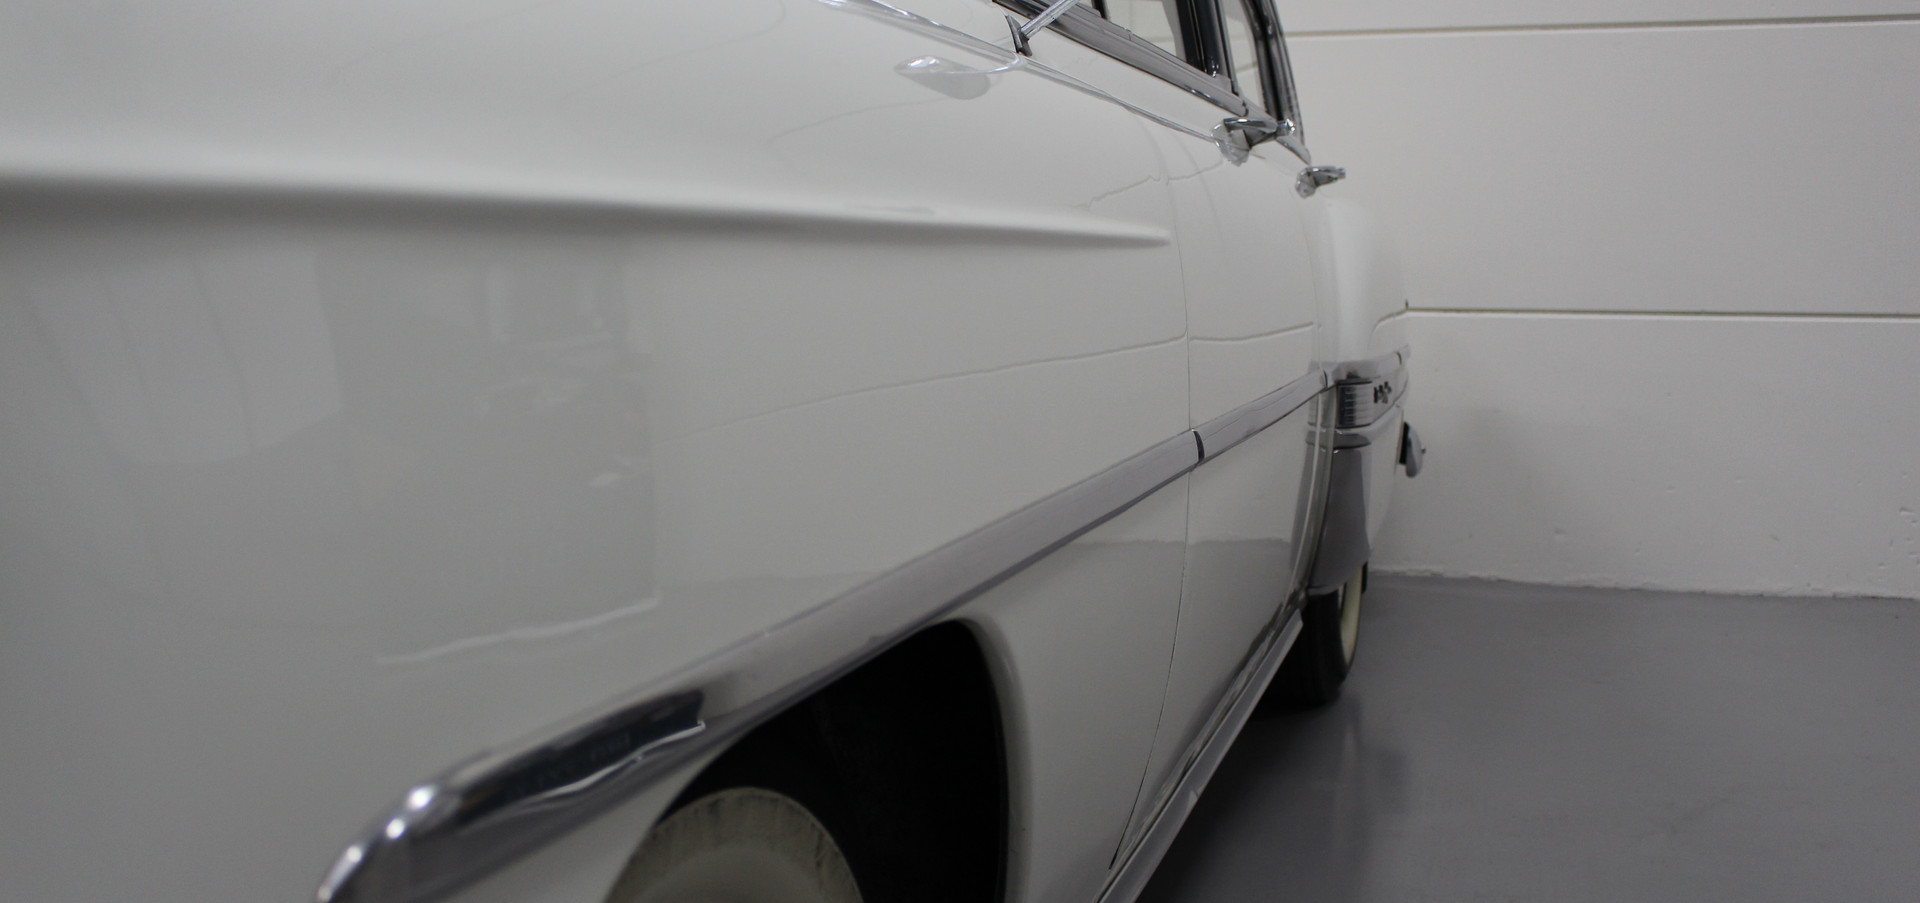 Chevrolet_BelAIr_1953_18.JPG